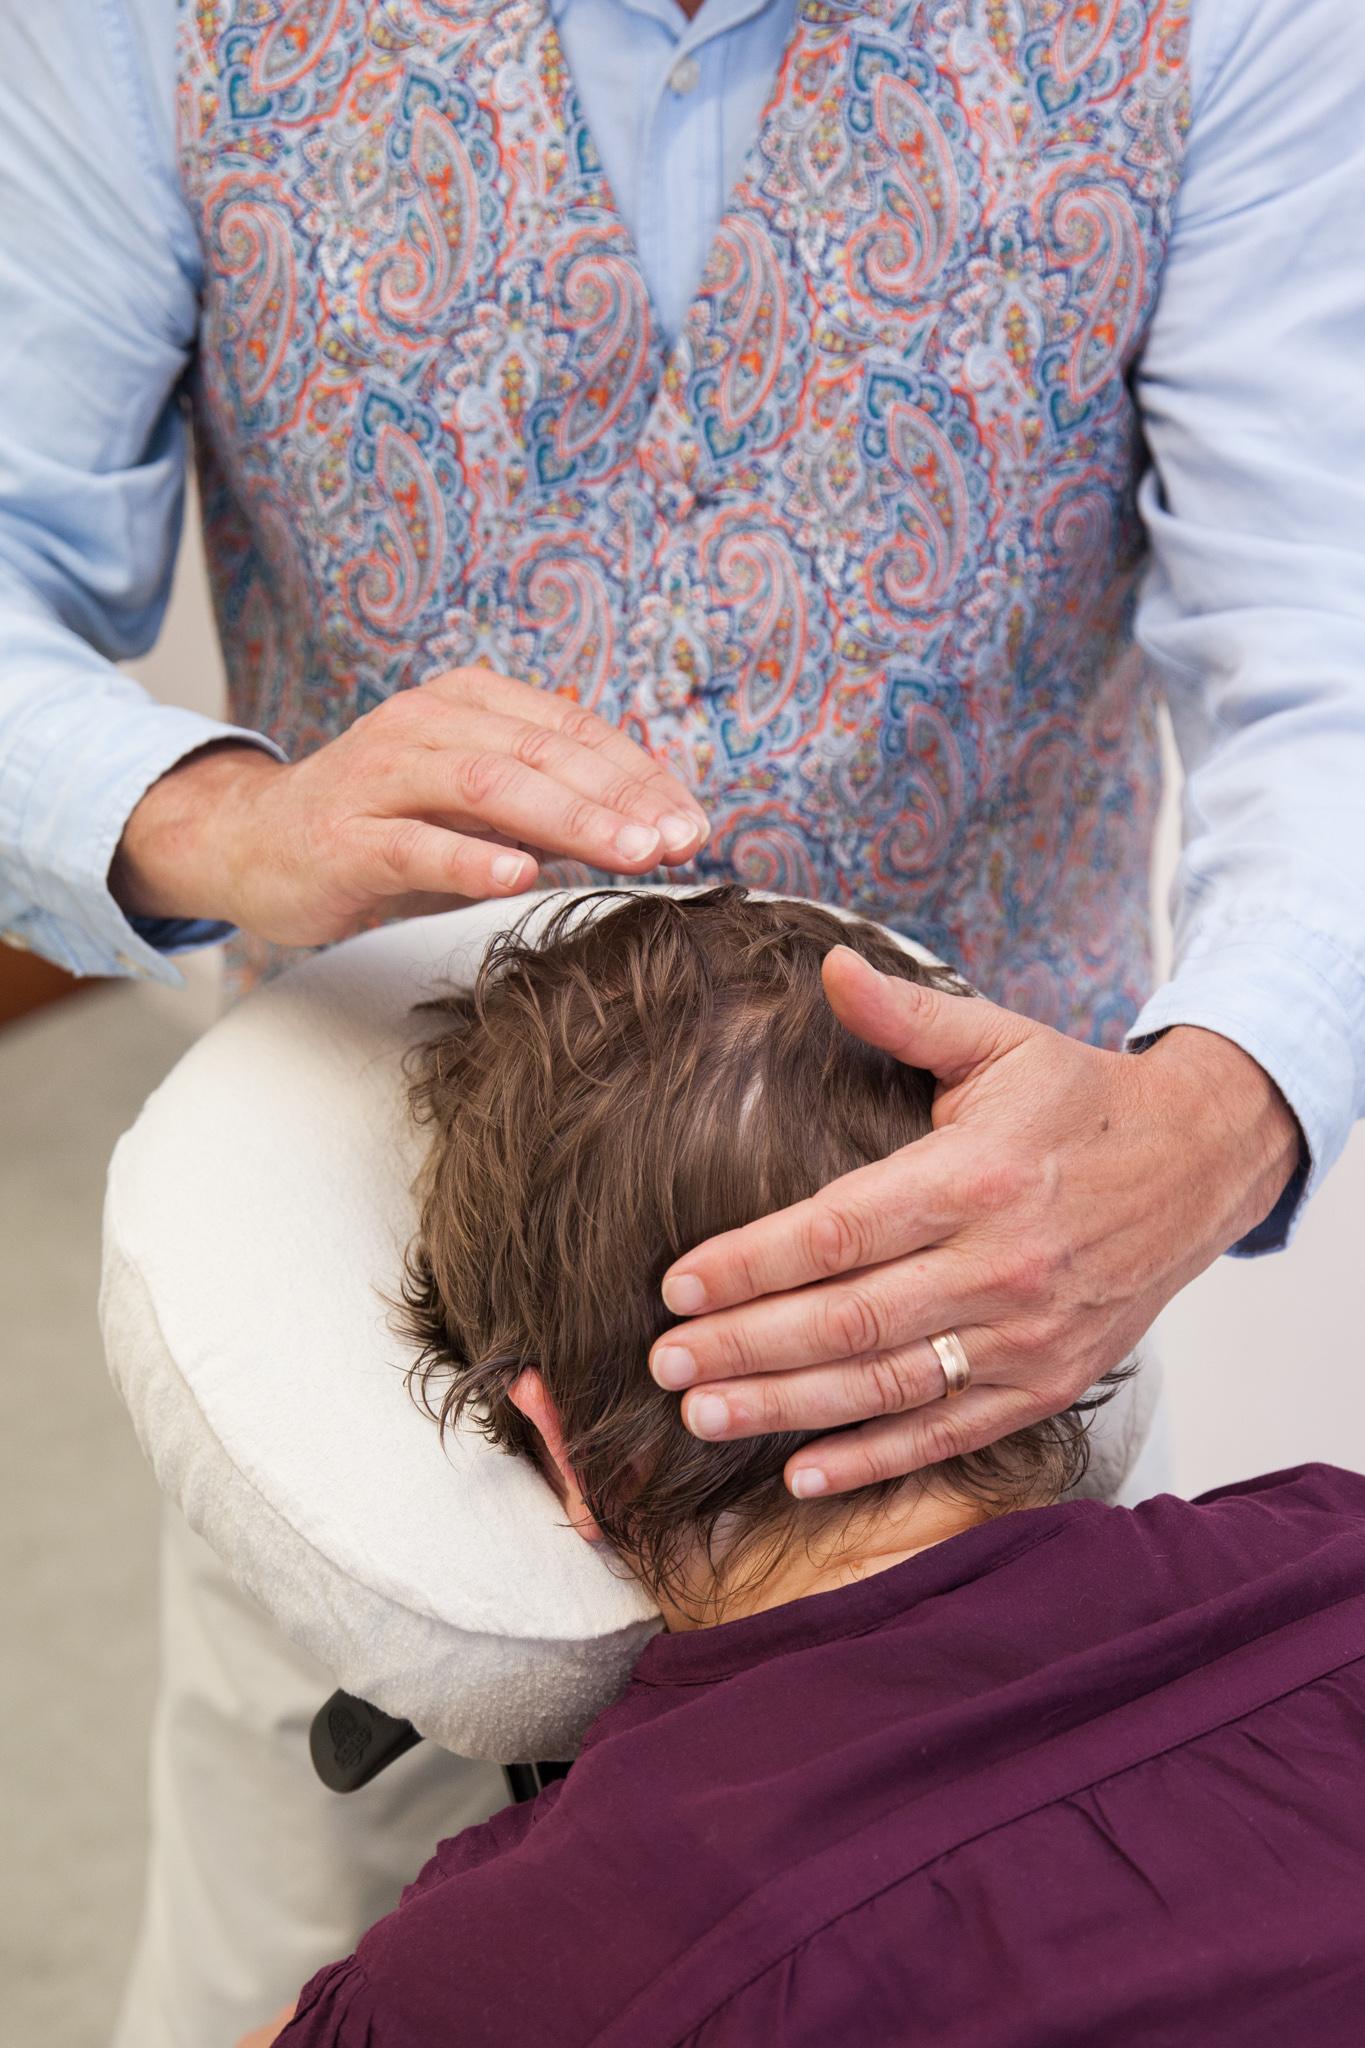 NeuroTouch on the head